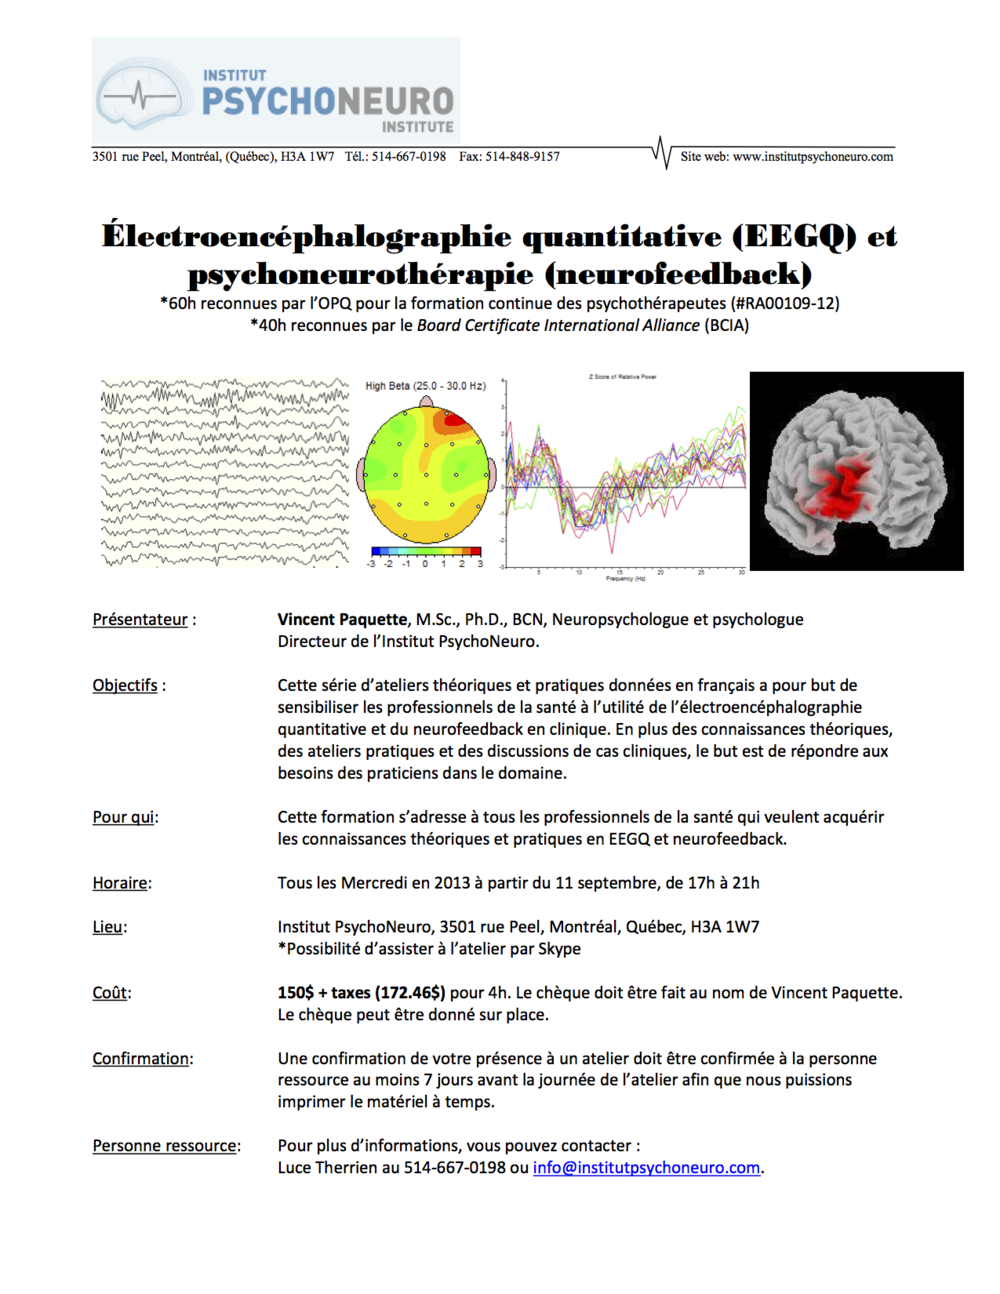 EEGQ et neurofeedback2013.png